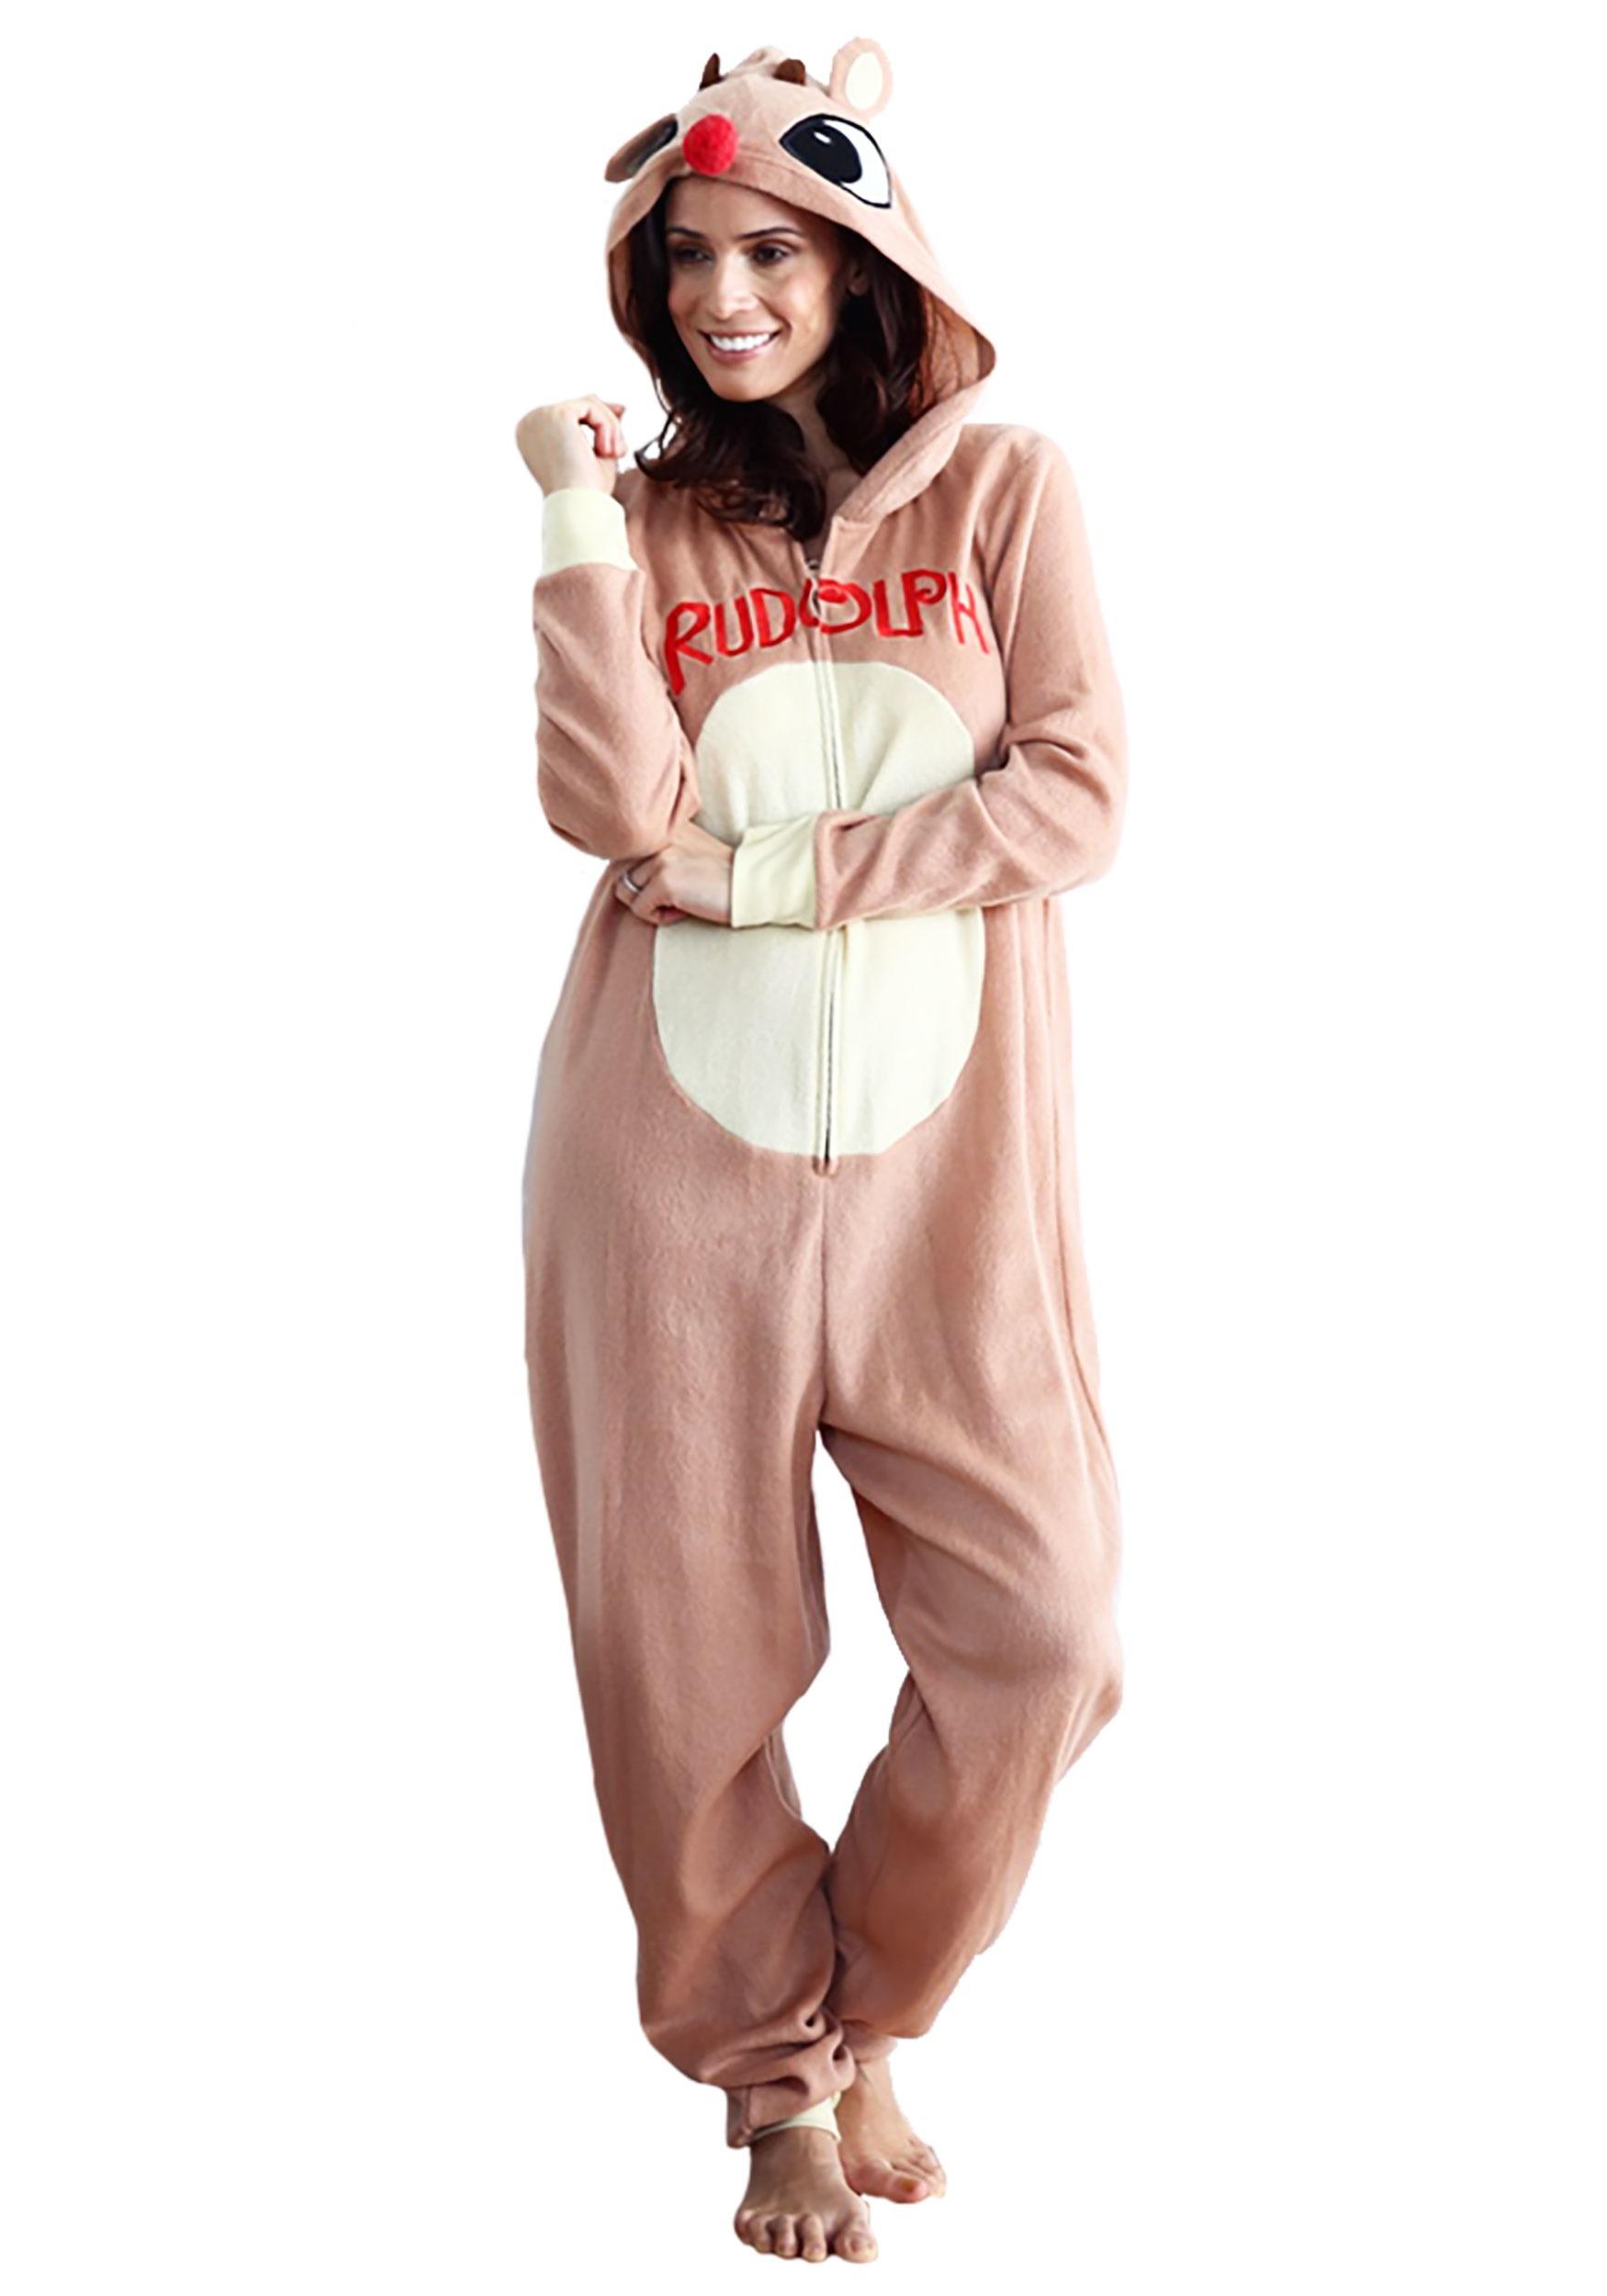 7f96ec8d74 Rudolph Pajama Costume for Women